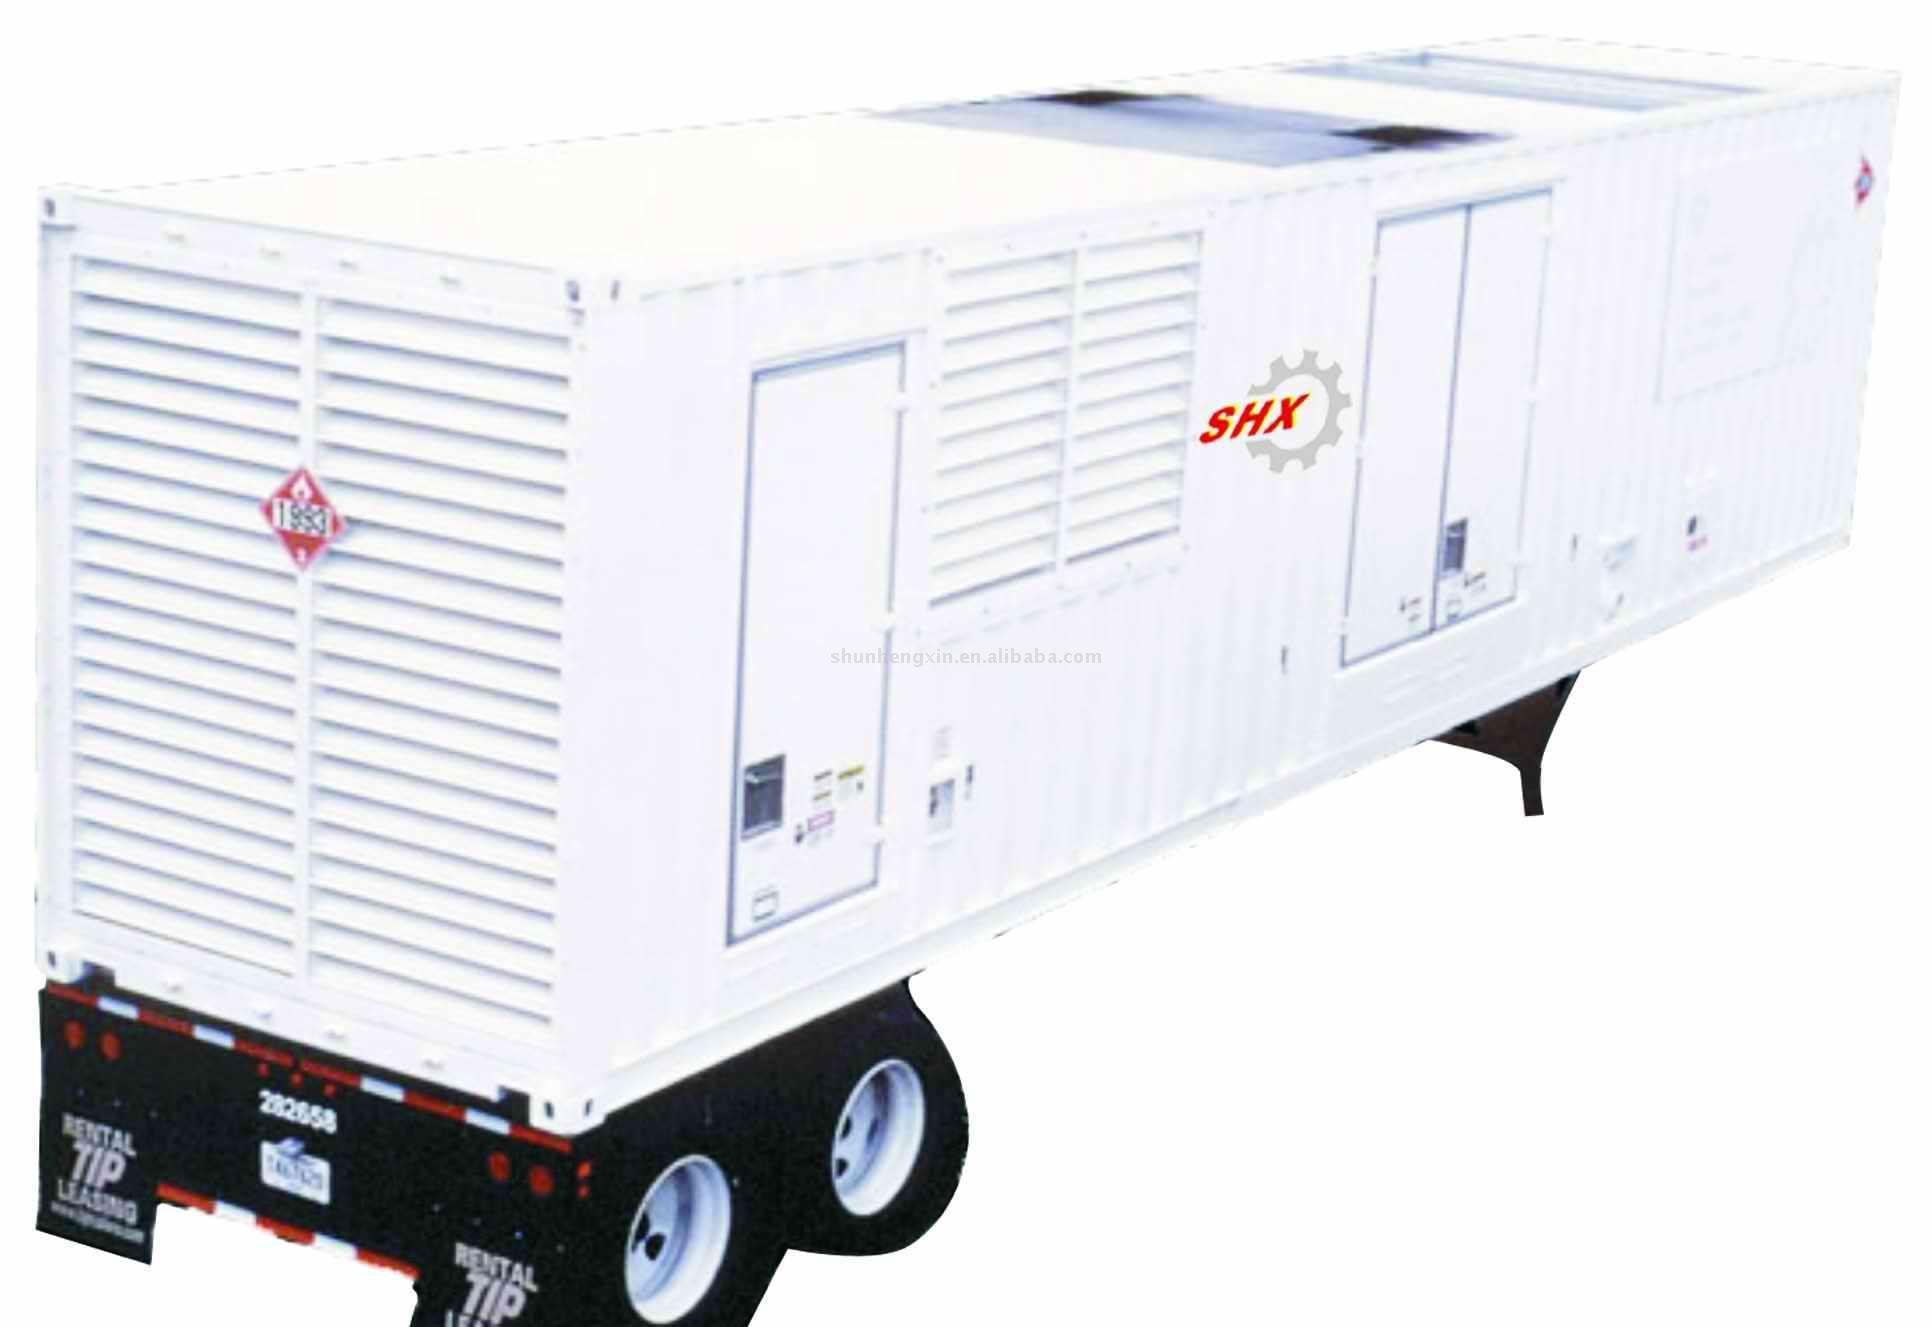 SHX-Cummins Soundproof Containerised Generator (SHX-Cummins Schallisolierung Container-Generator)